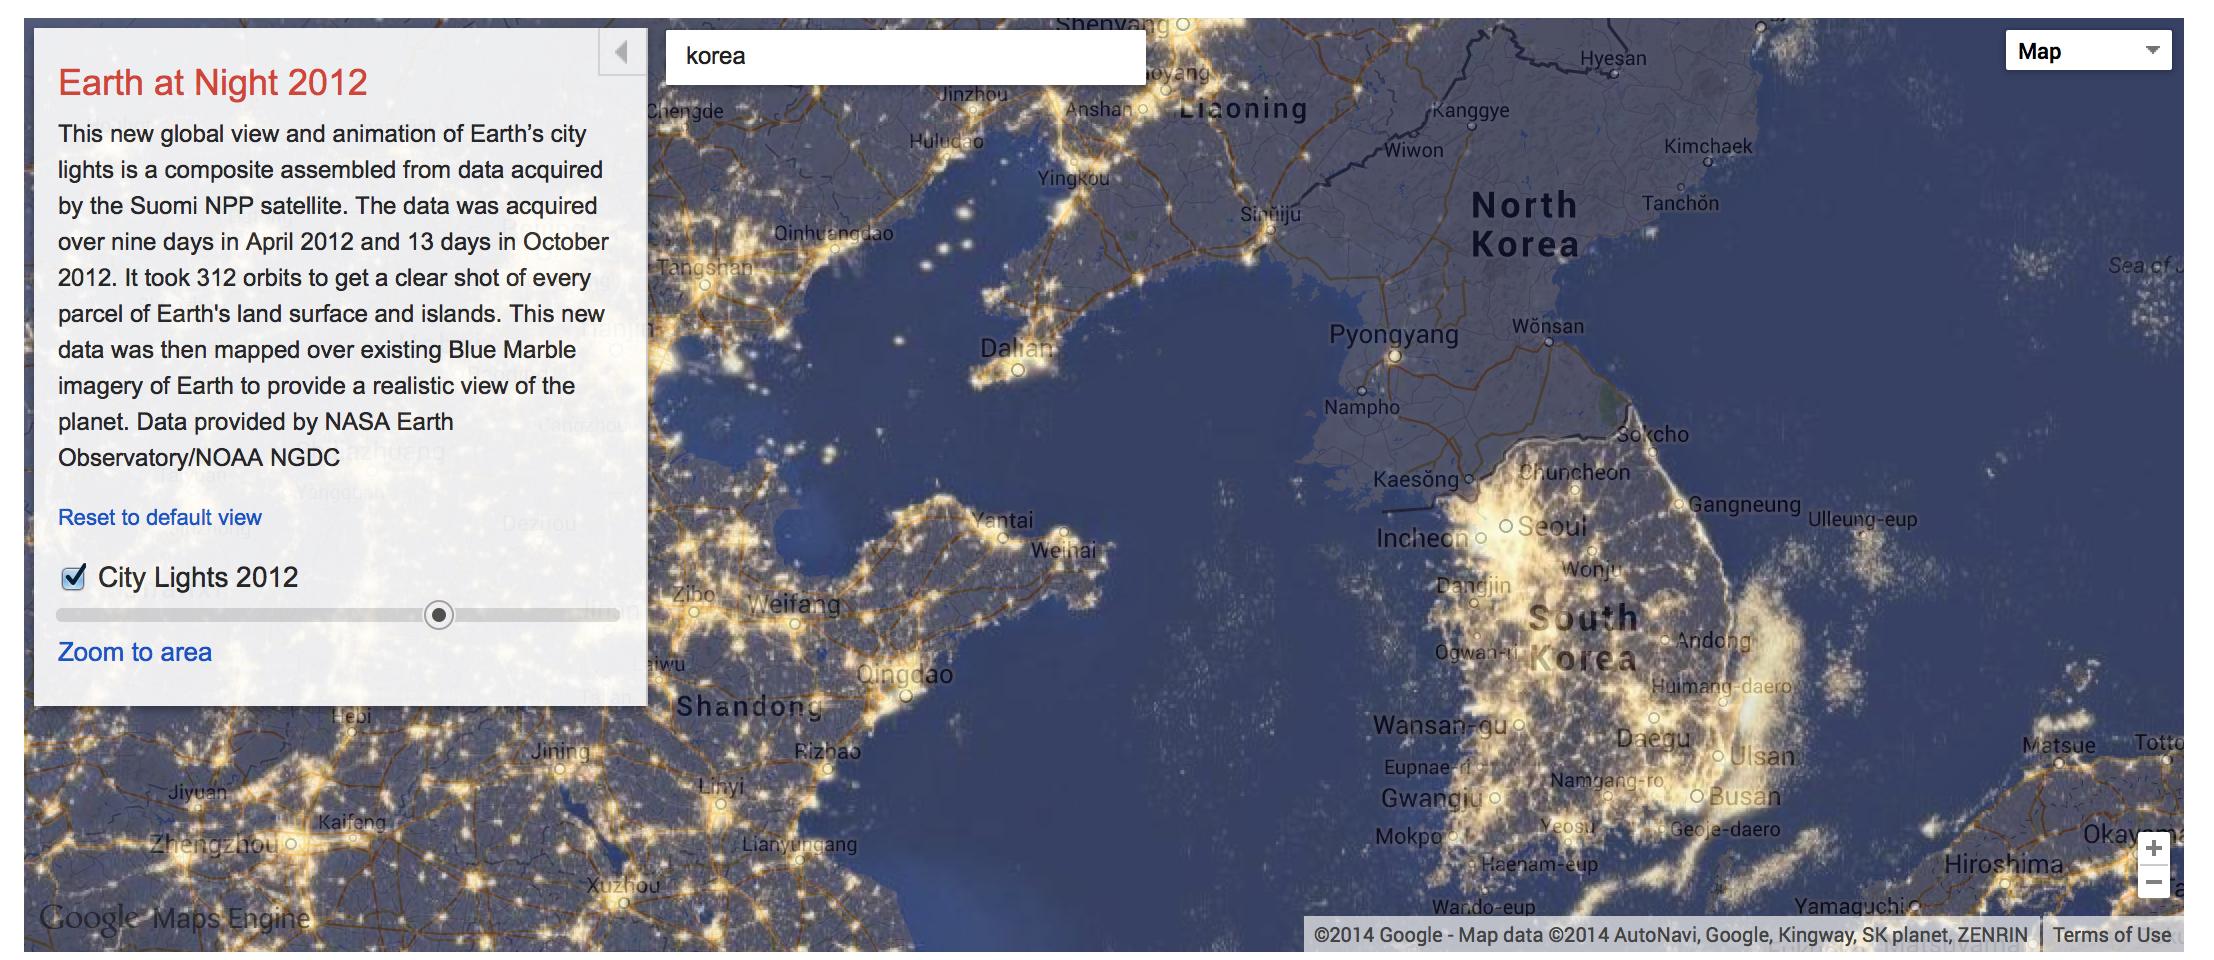 Google maps gallery interactive digital atlas history tech korea at night gumiabroncs Images